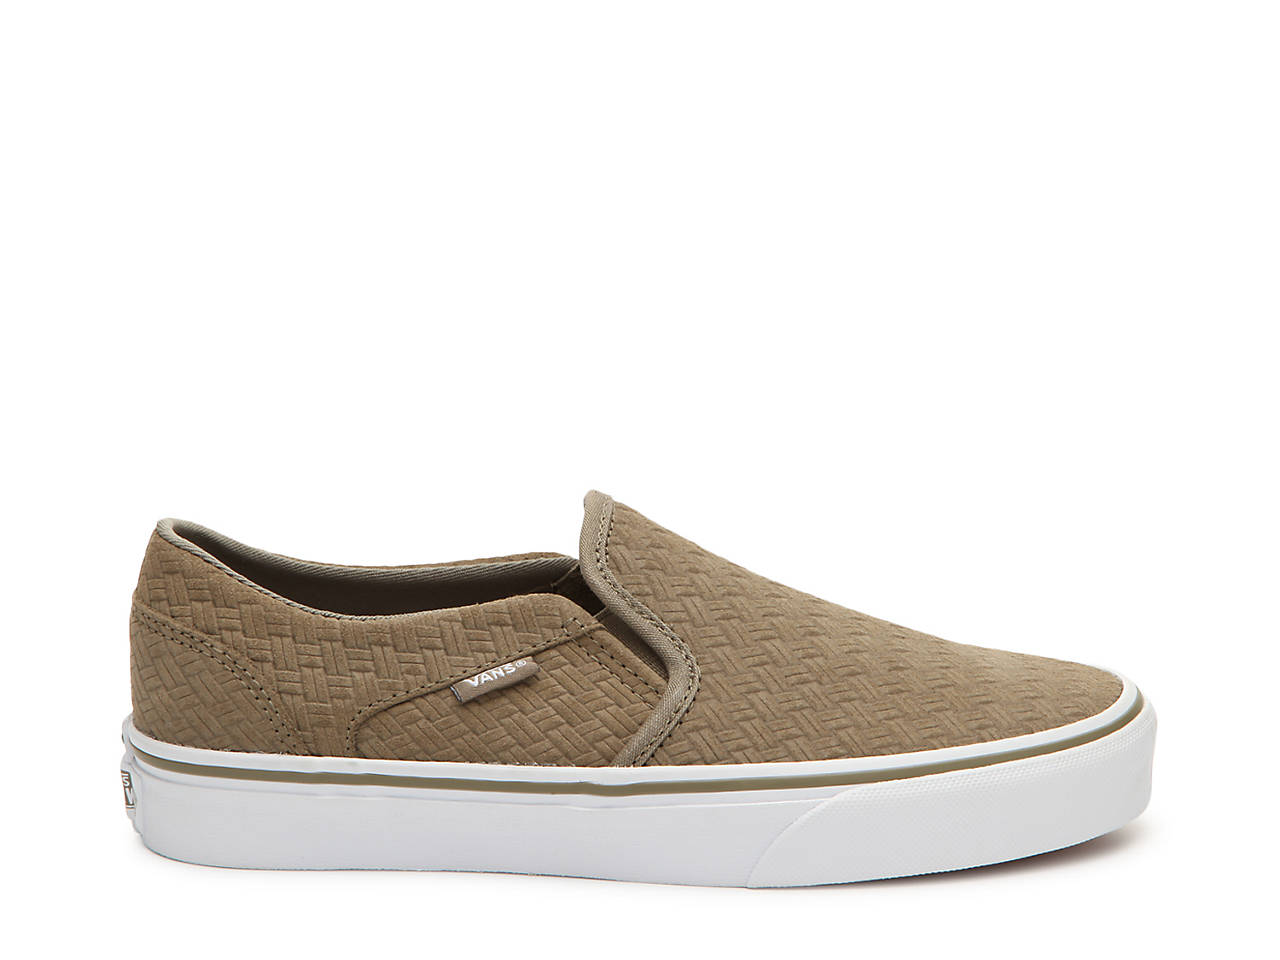 64e7772aaf Vans Asher Slip-On Sneaker - Women s Women s Shoes